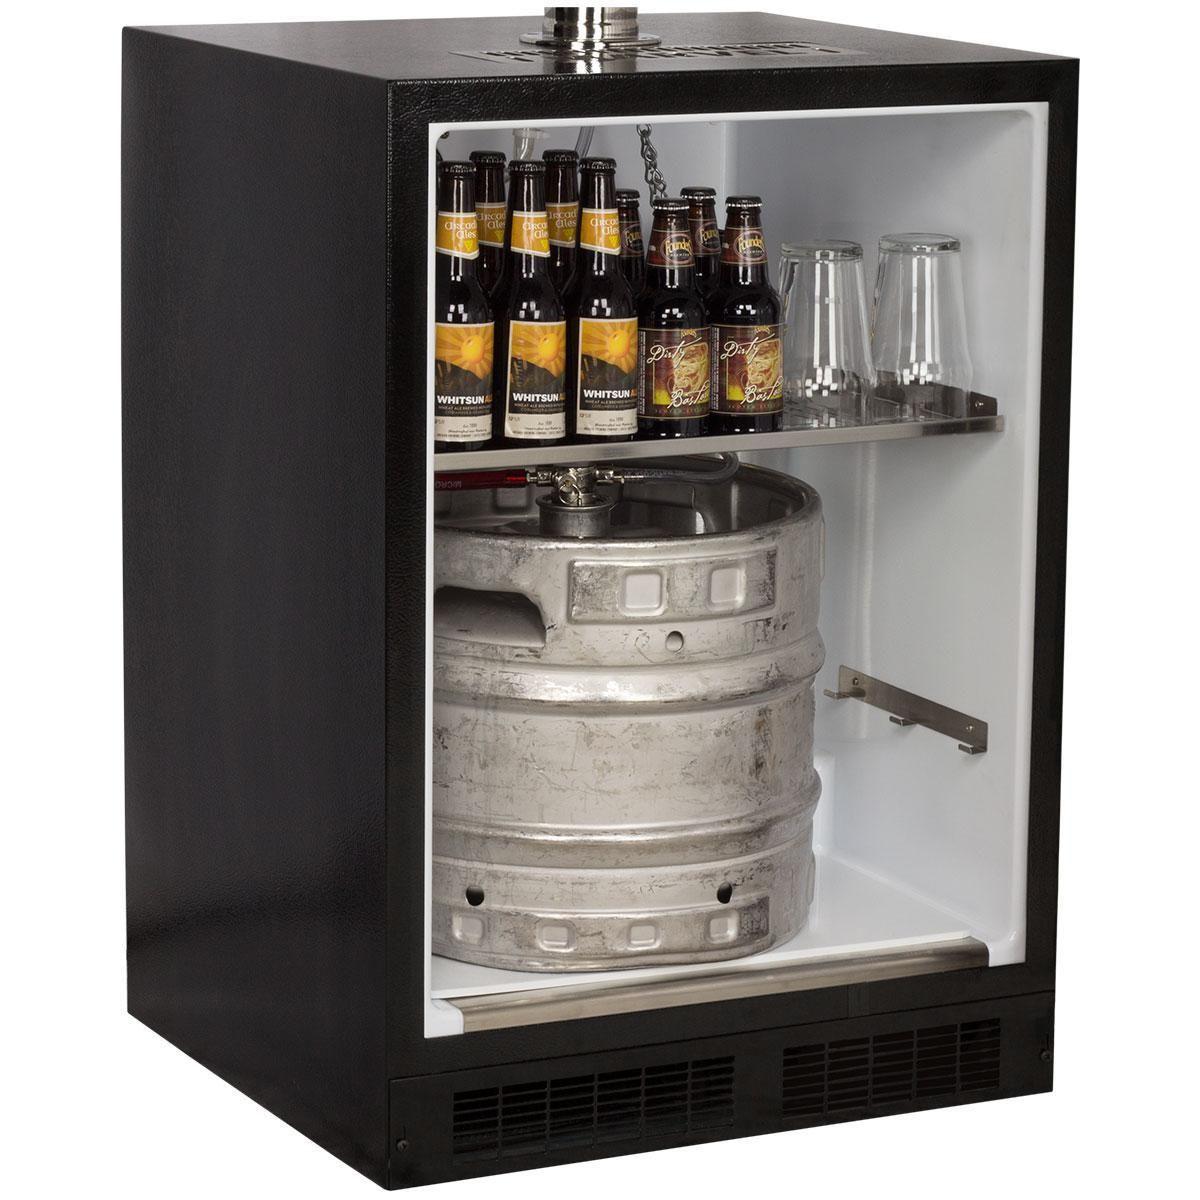 "Marvel 24"" Panel Ready, Single Tap BuiltIn Beer Dispenser"